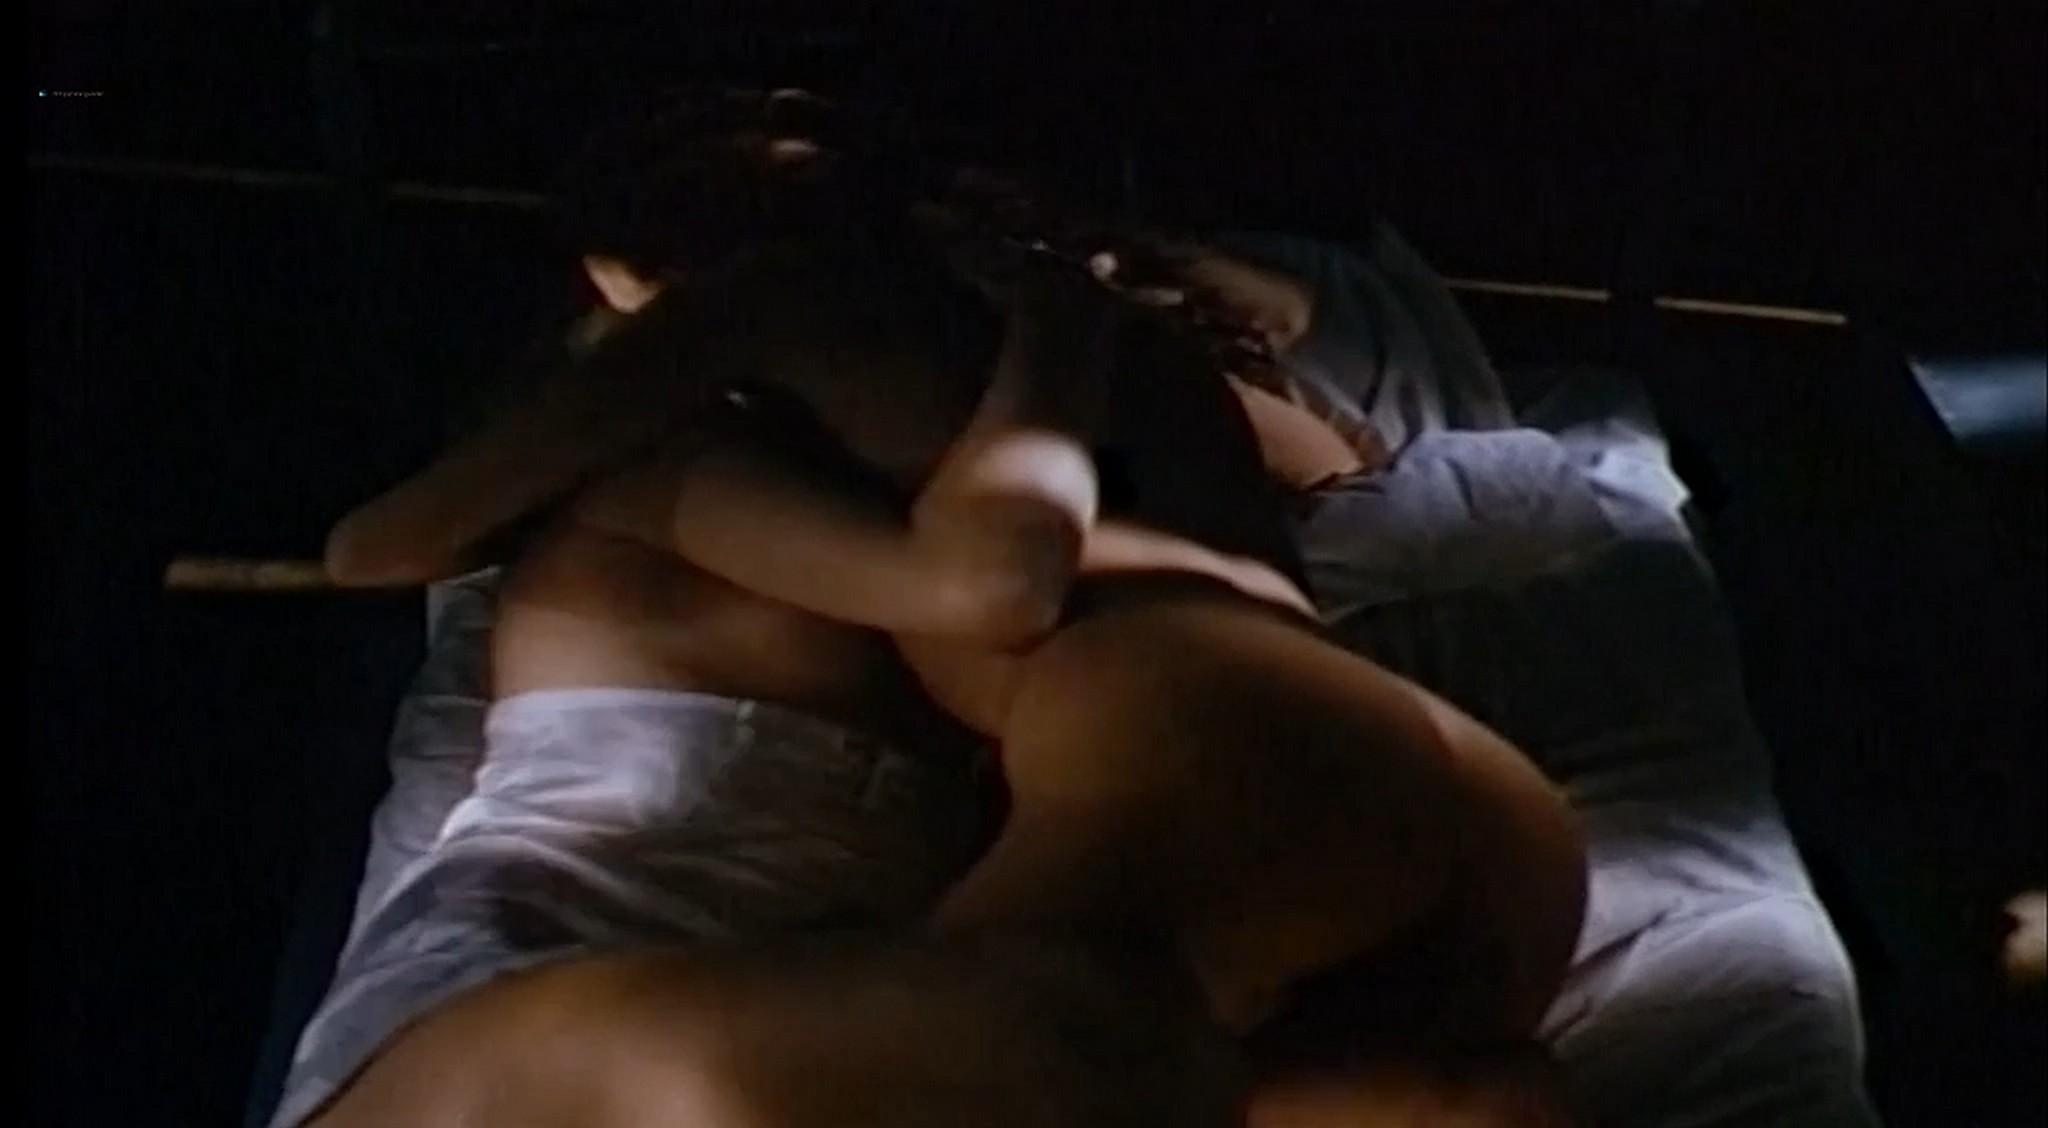 Carolyn Monroe nude Caroline Laurence and others nude sex Emmanuelle 7 1993 DVDRip 12